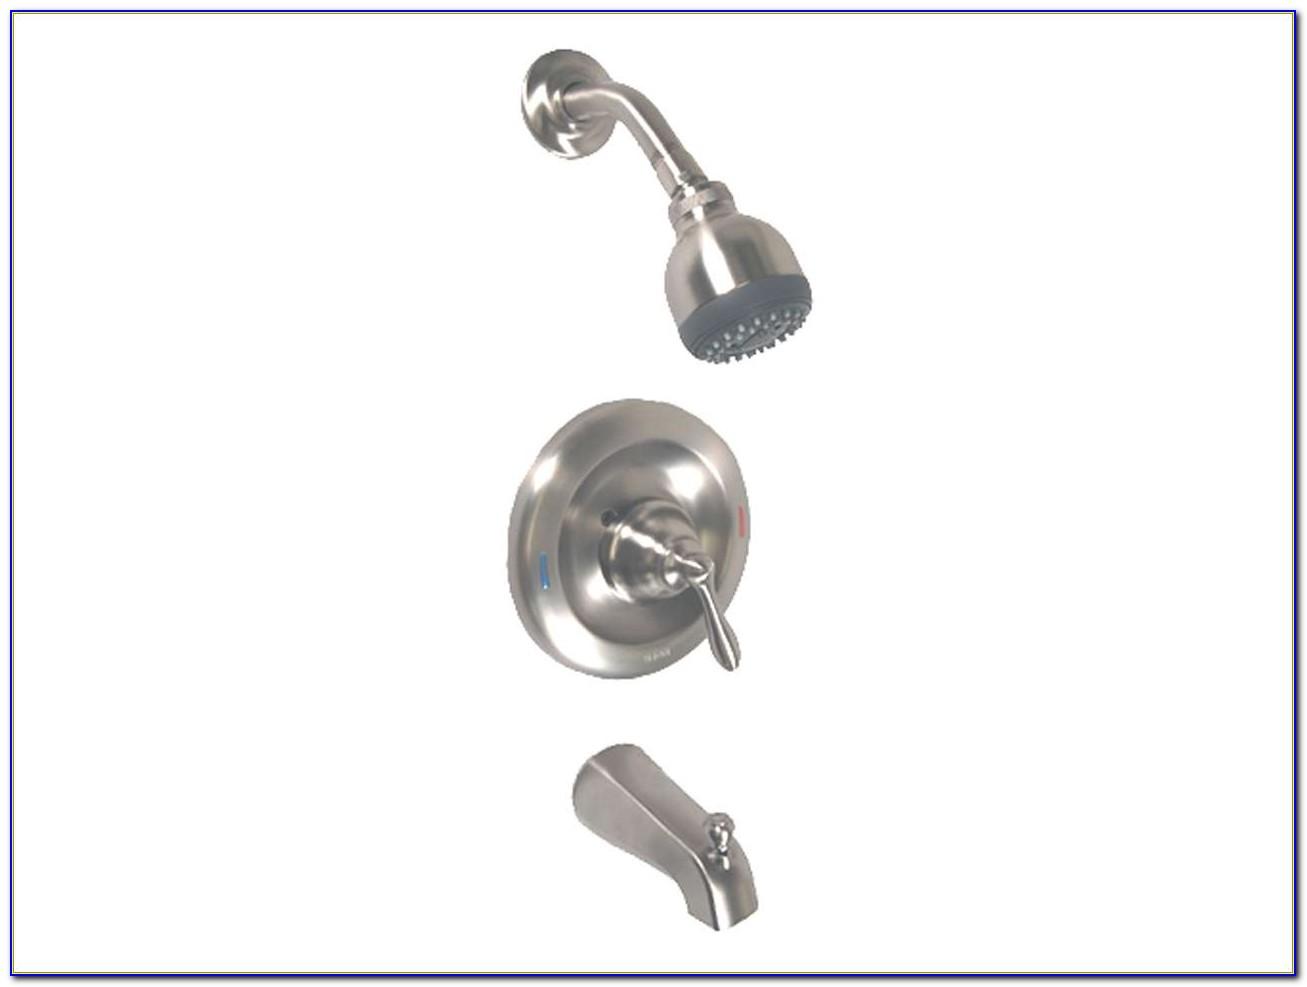 Moen Caldwell Bathroom Faucet Installation Instructions